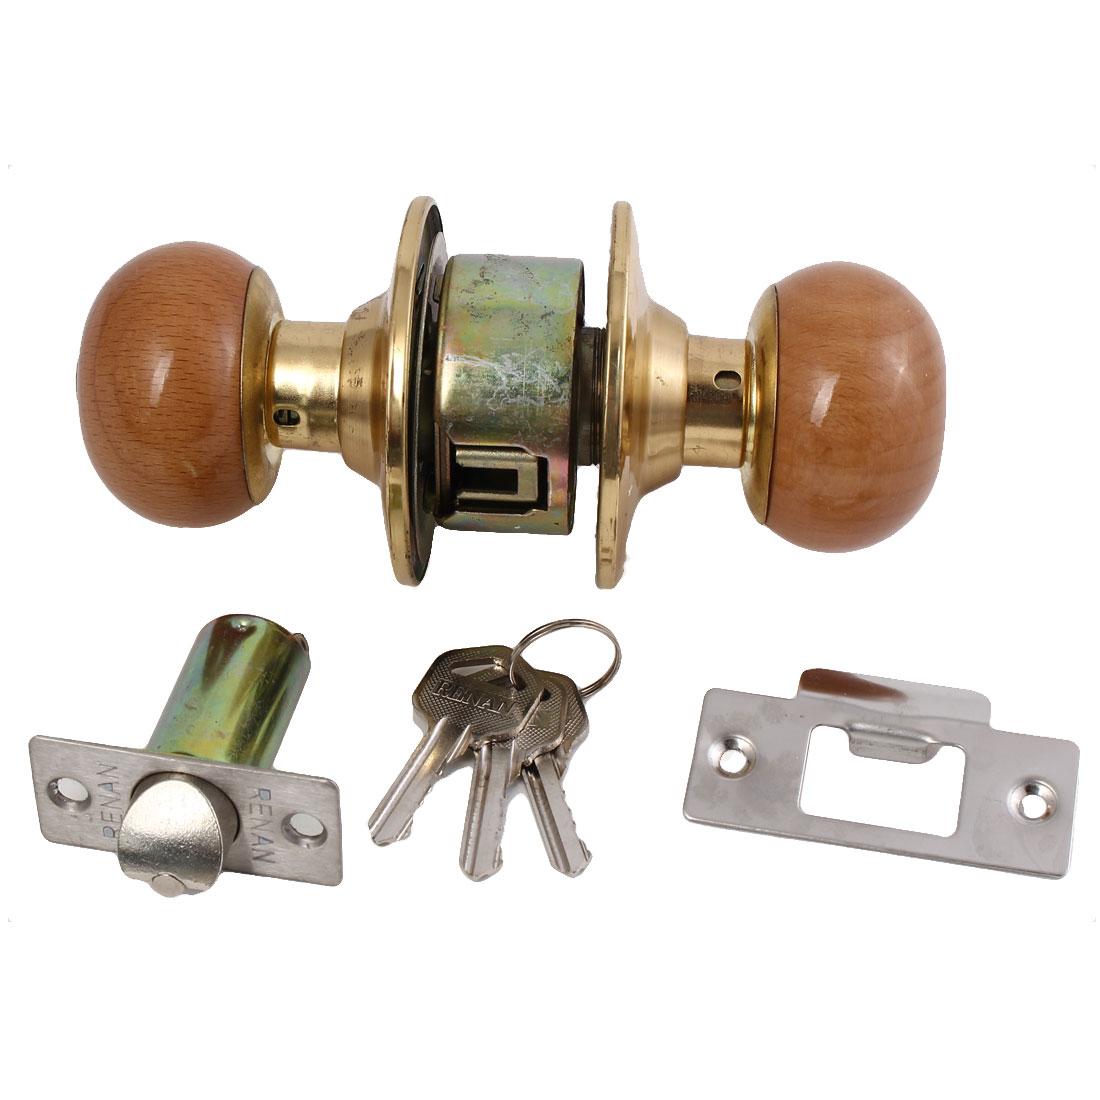 Home Bedroom Bathroom Entry Door Wooden Round Knob Handle Lock Lockset